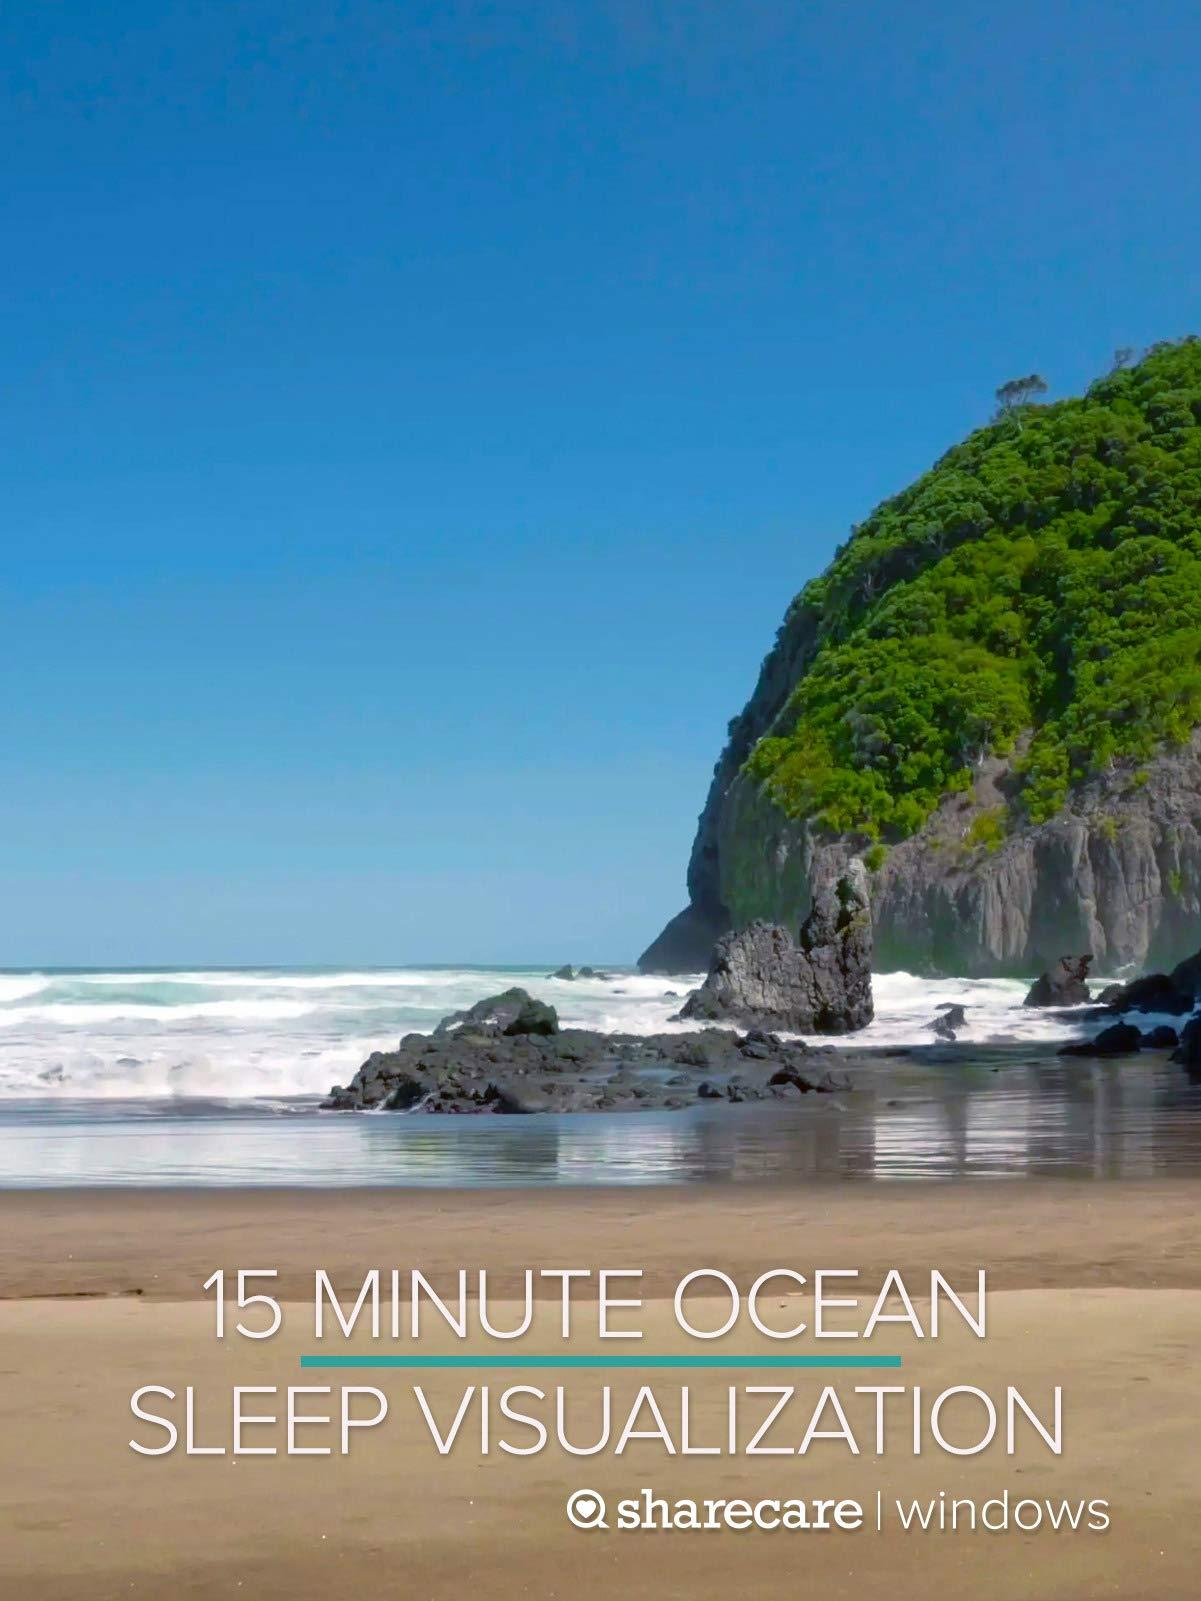 15 Minute Ocean Sleep Visualization